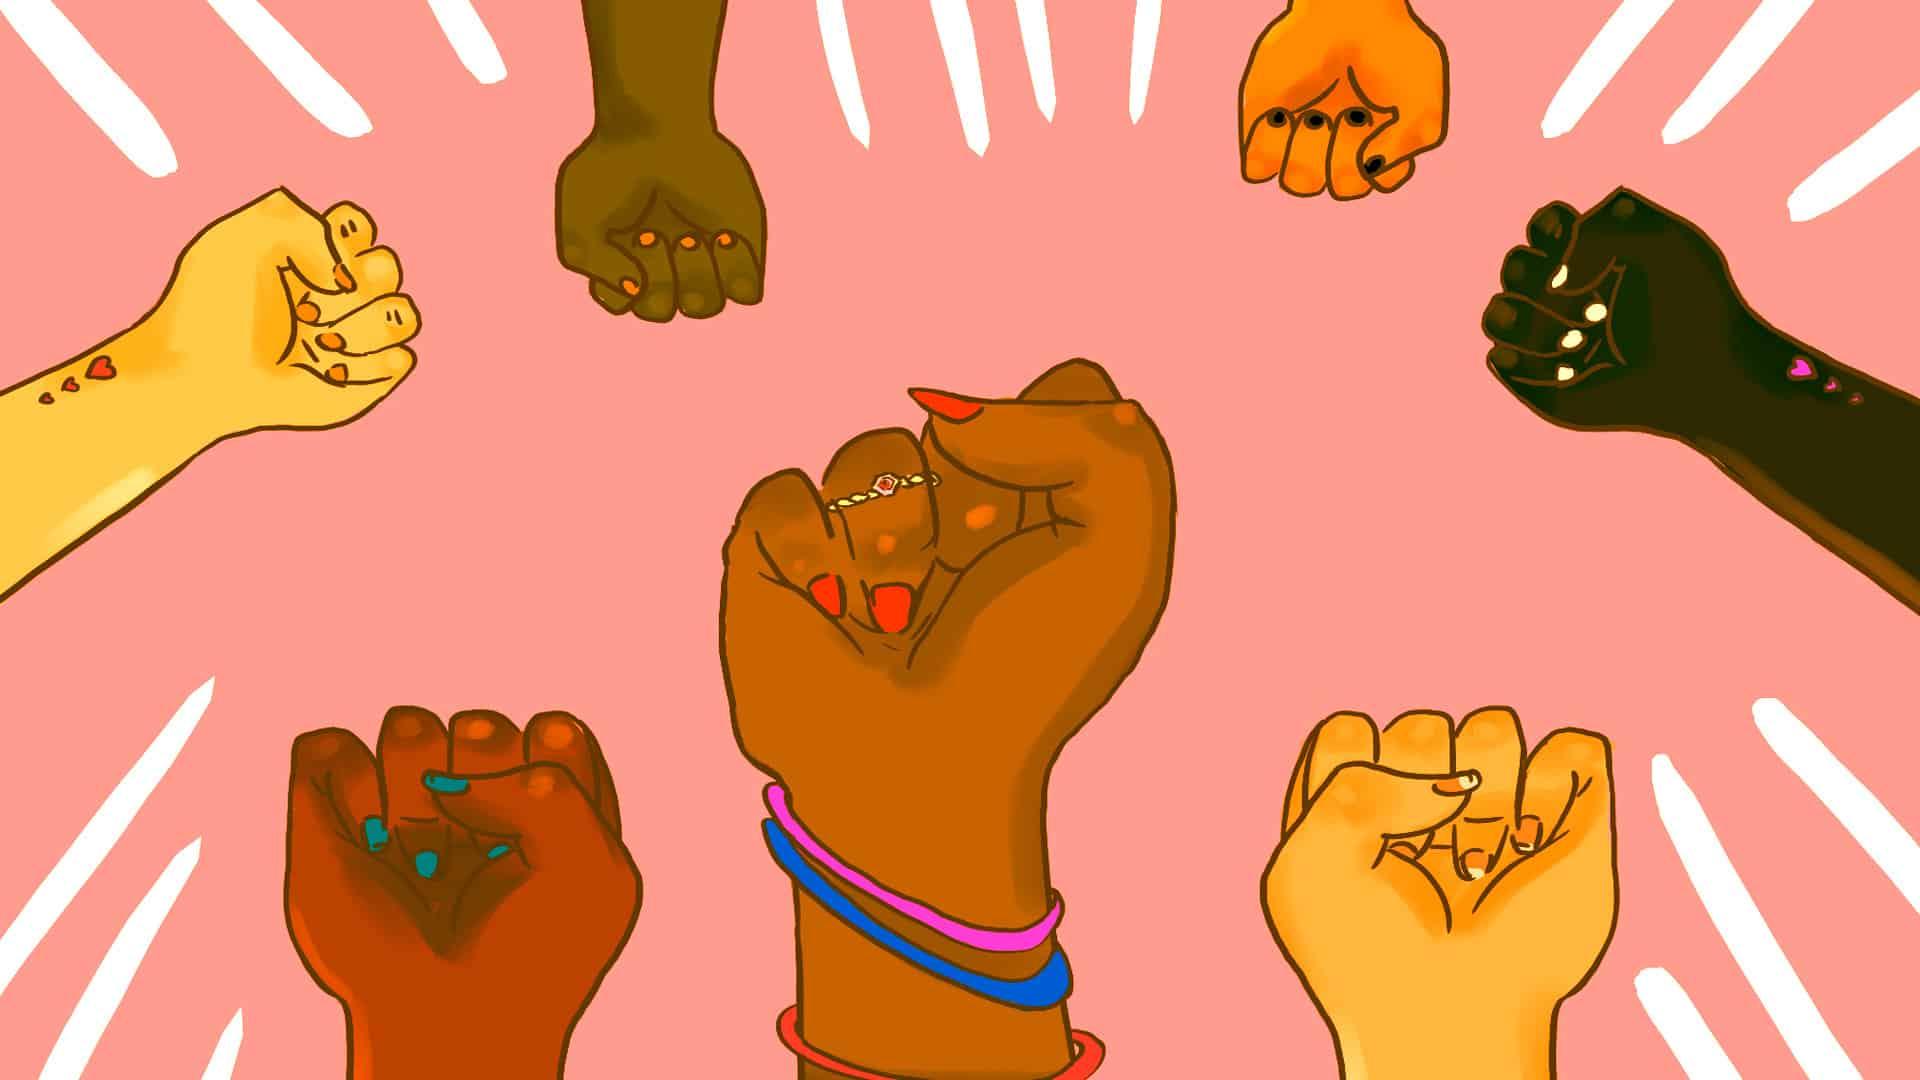 Google unveils $25 mn global grant for NGOs, social enterprises working on women empowerment